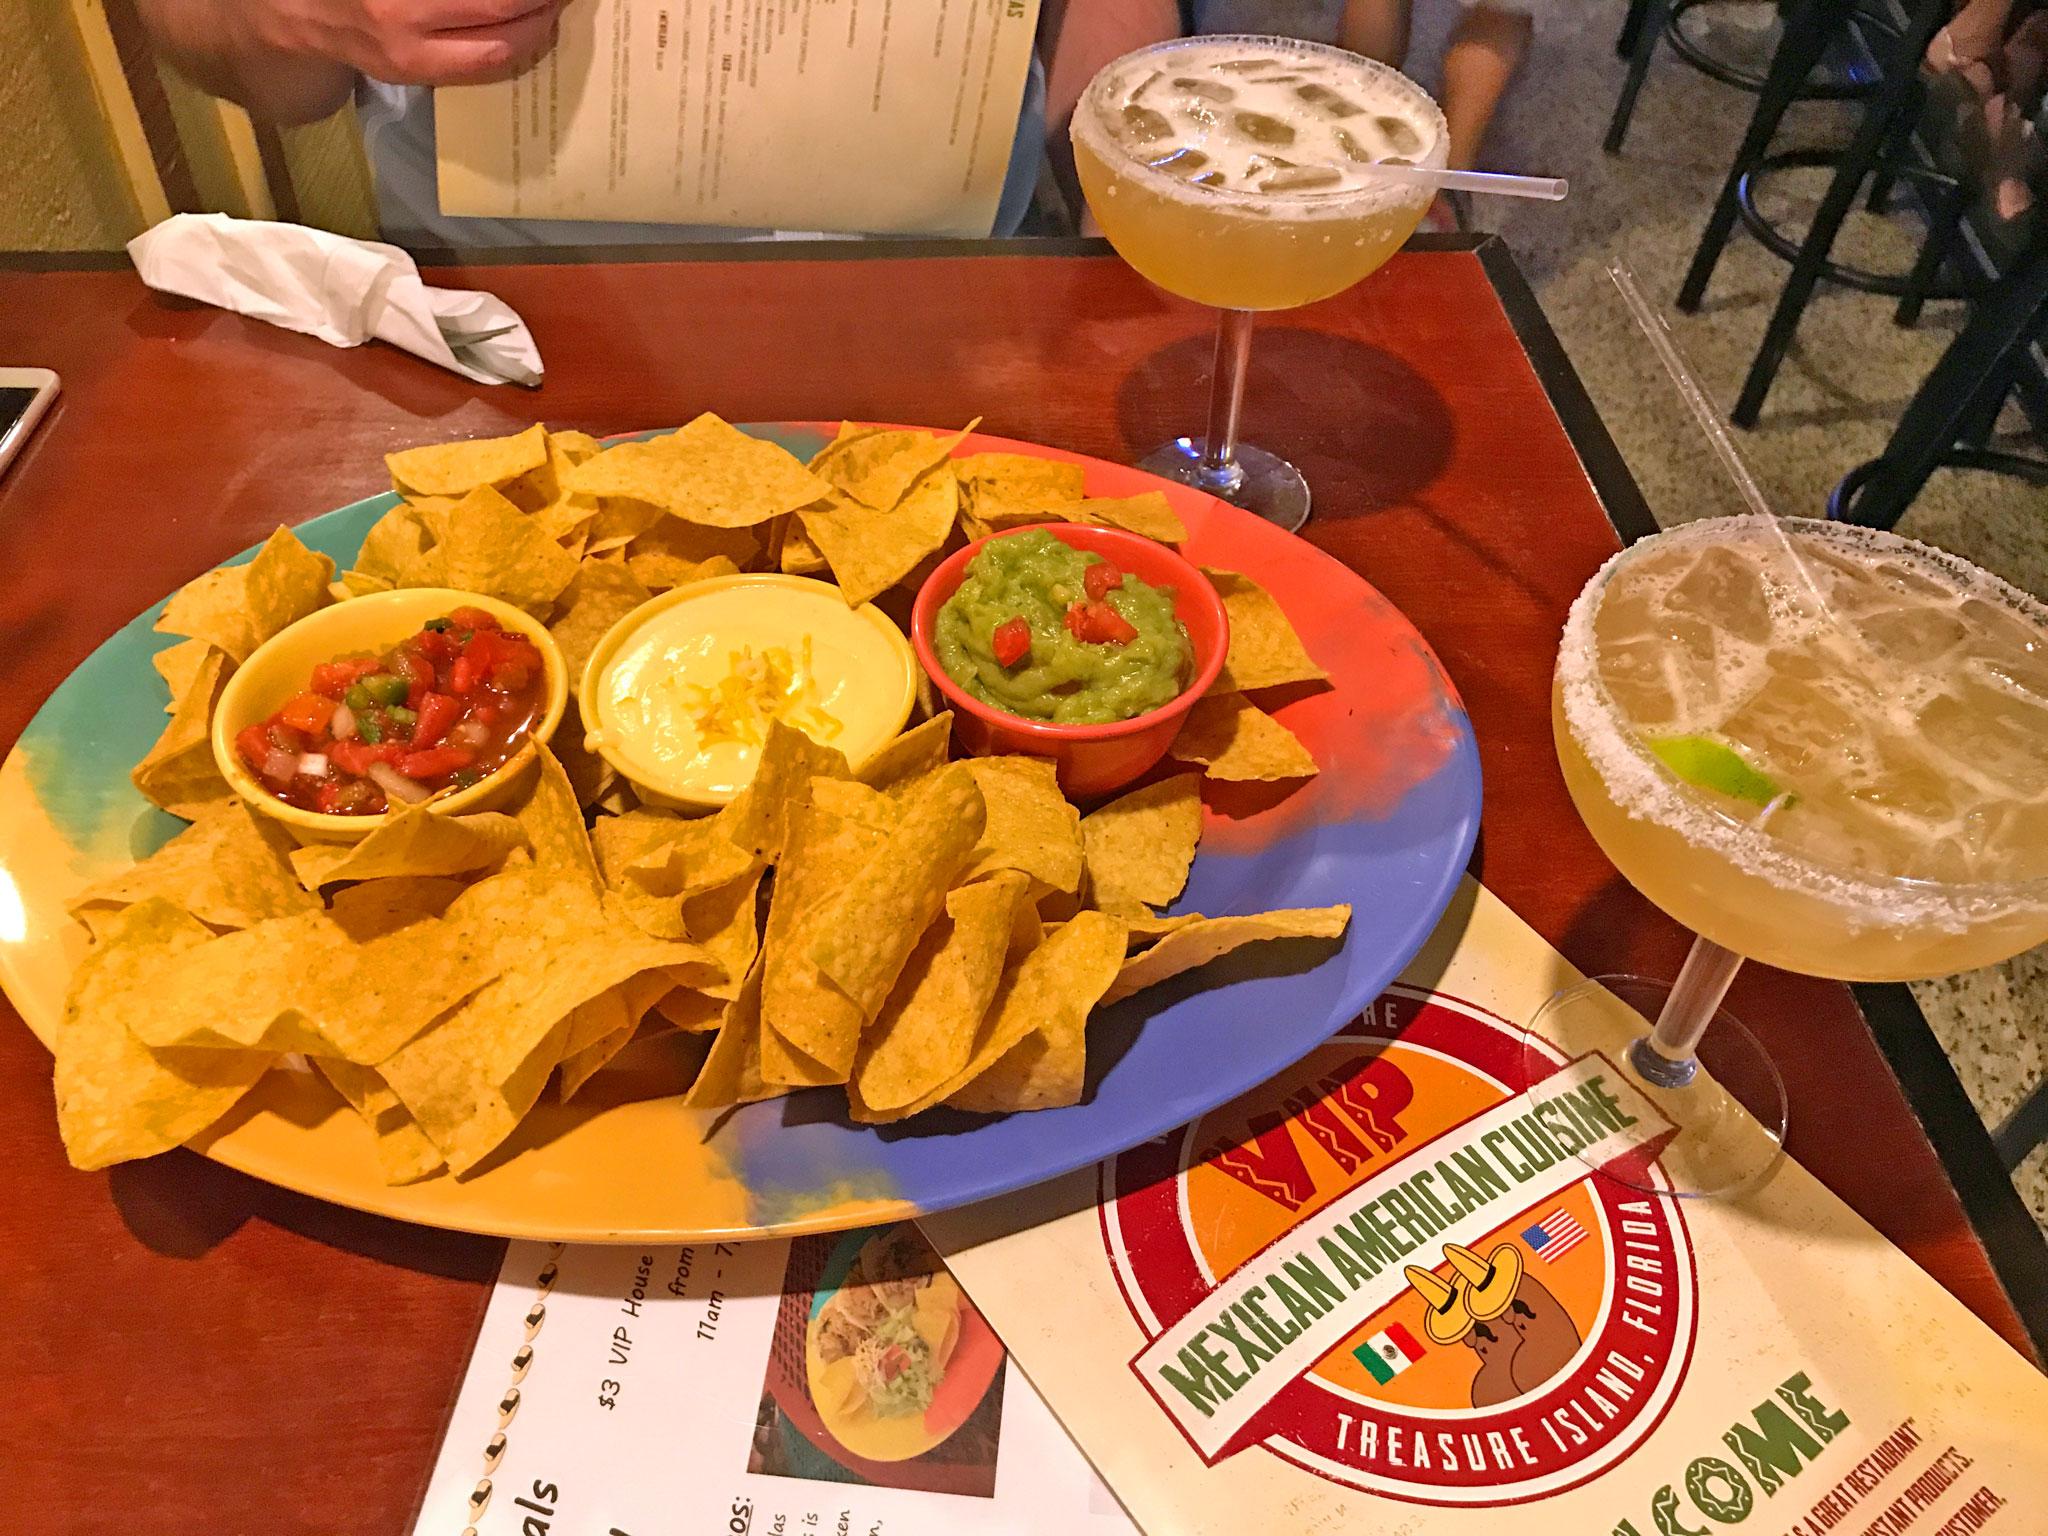 Three Amigos Appetizer & Millionaire Margaritas